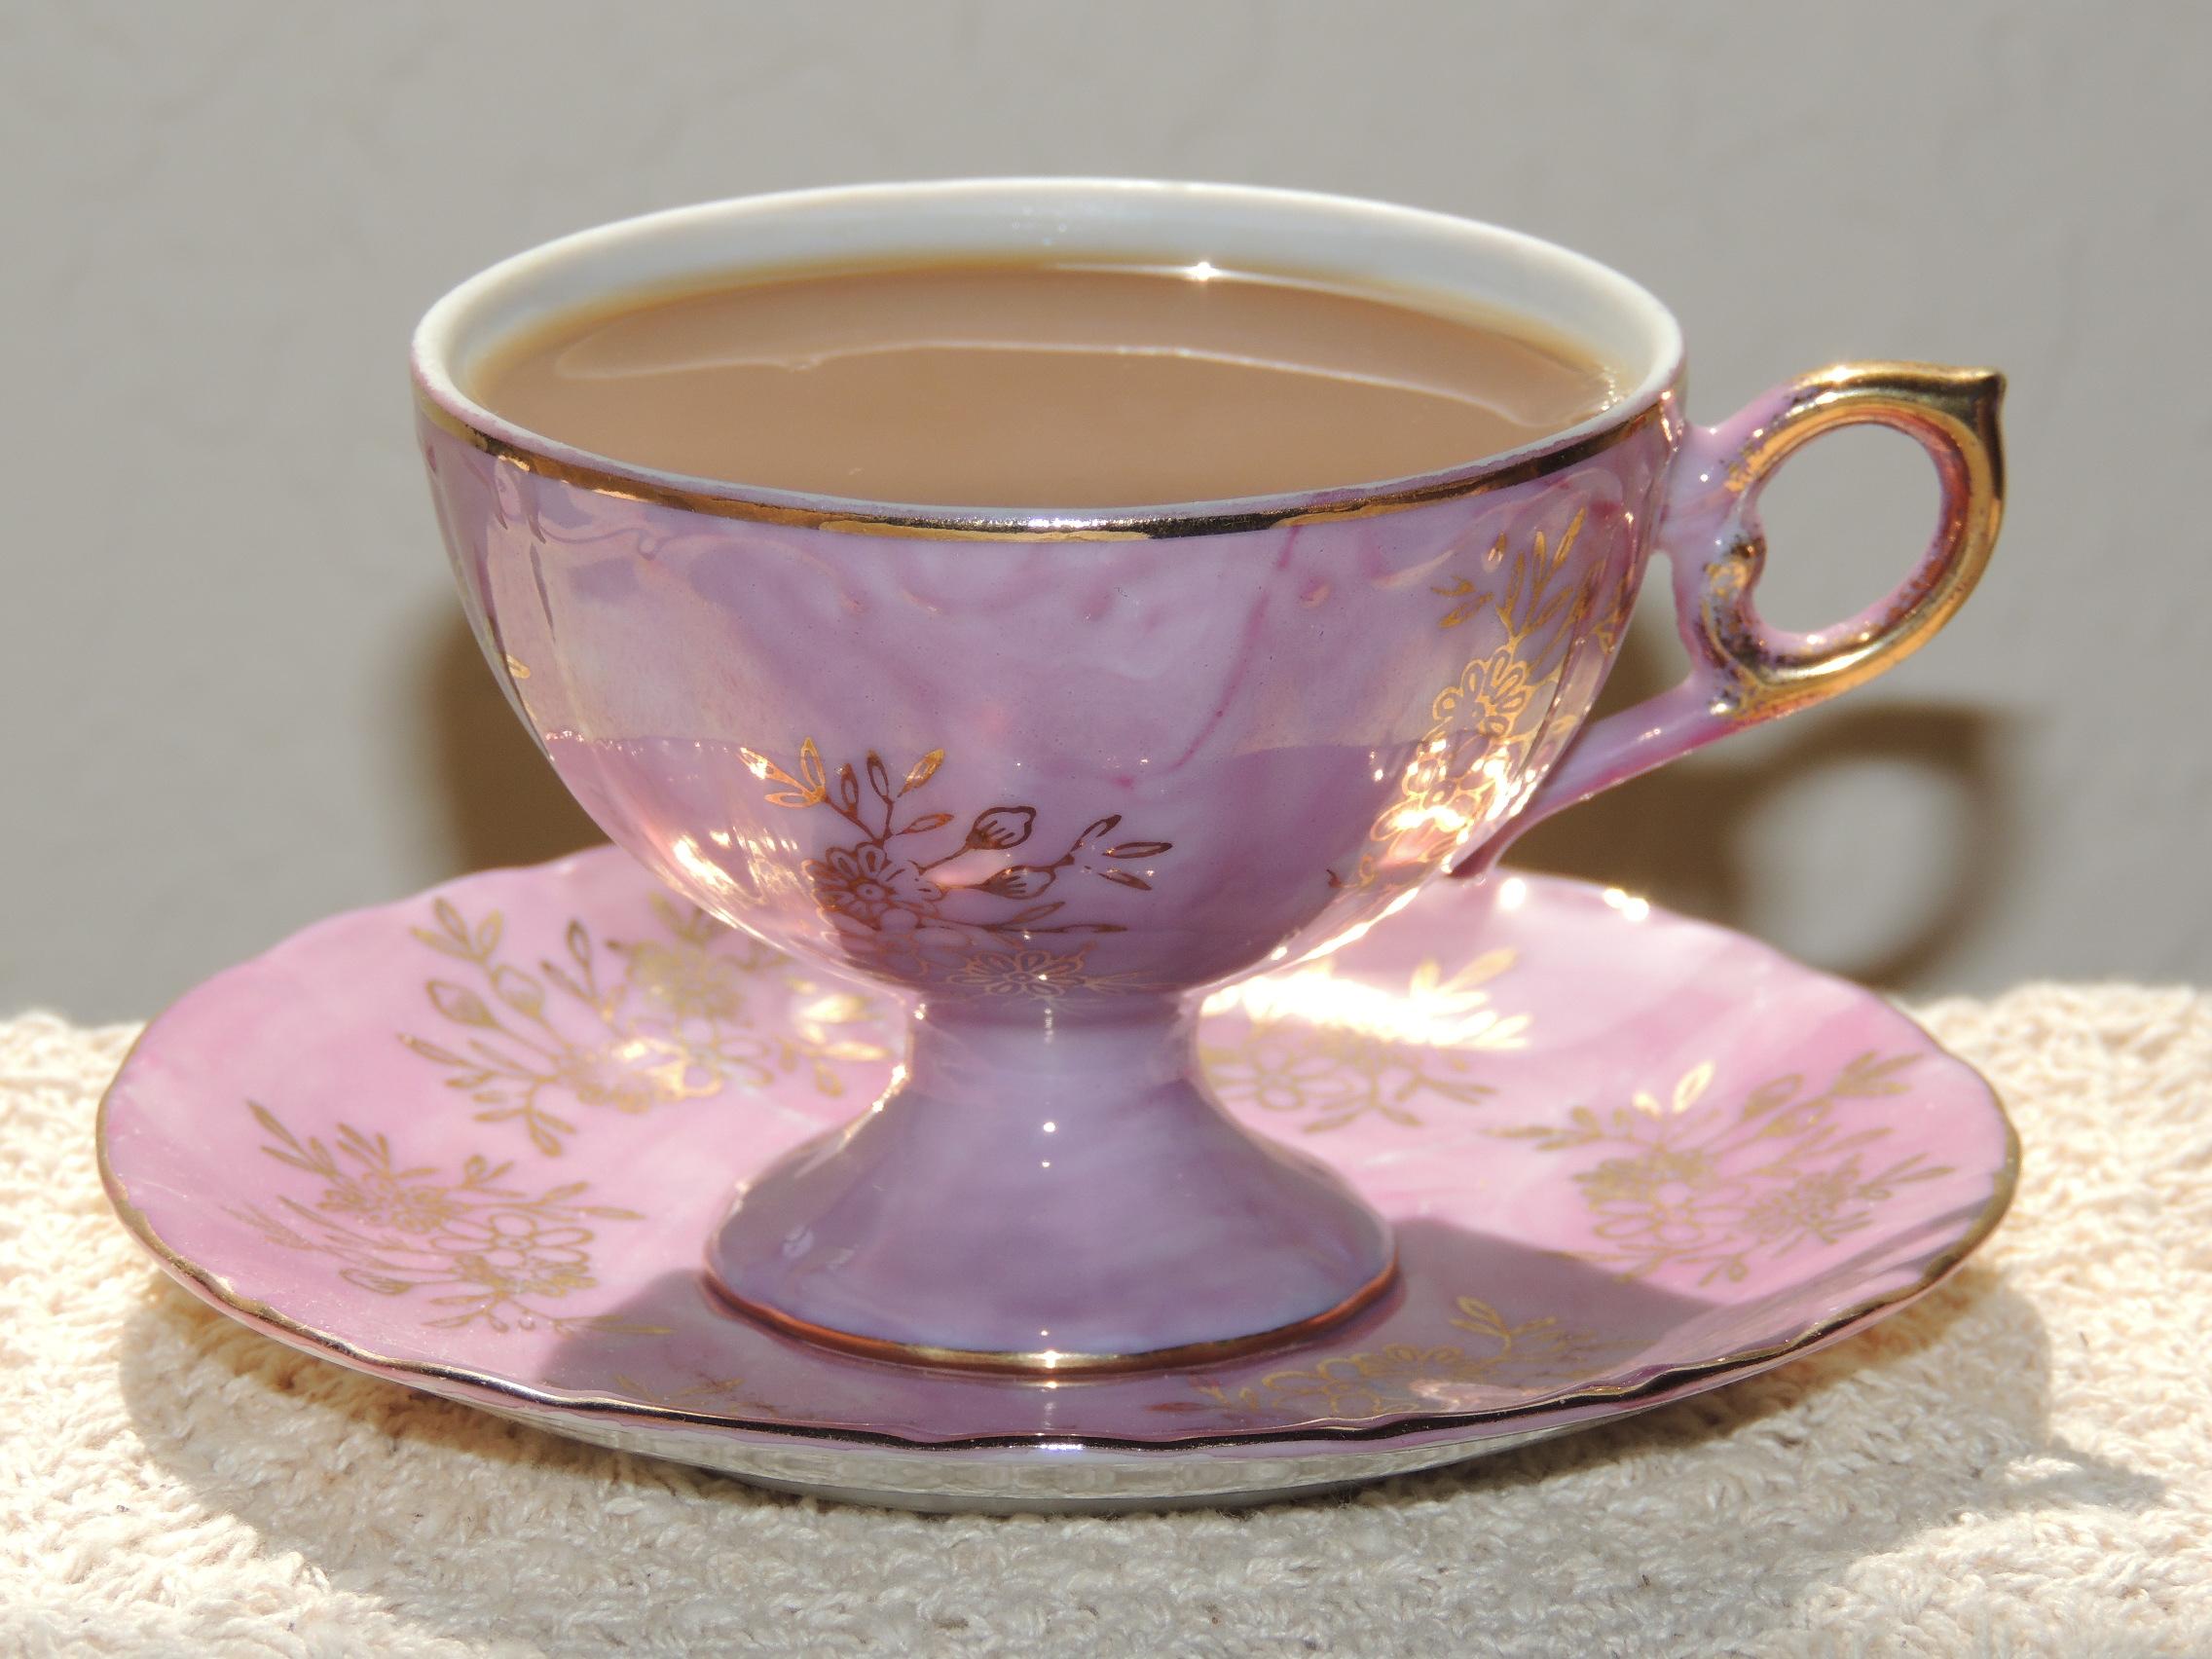 Pretty And Unique Tea Cup Truly Skrumptious